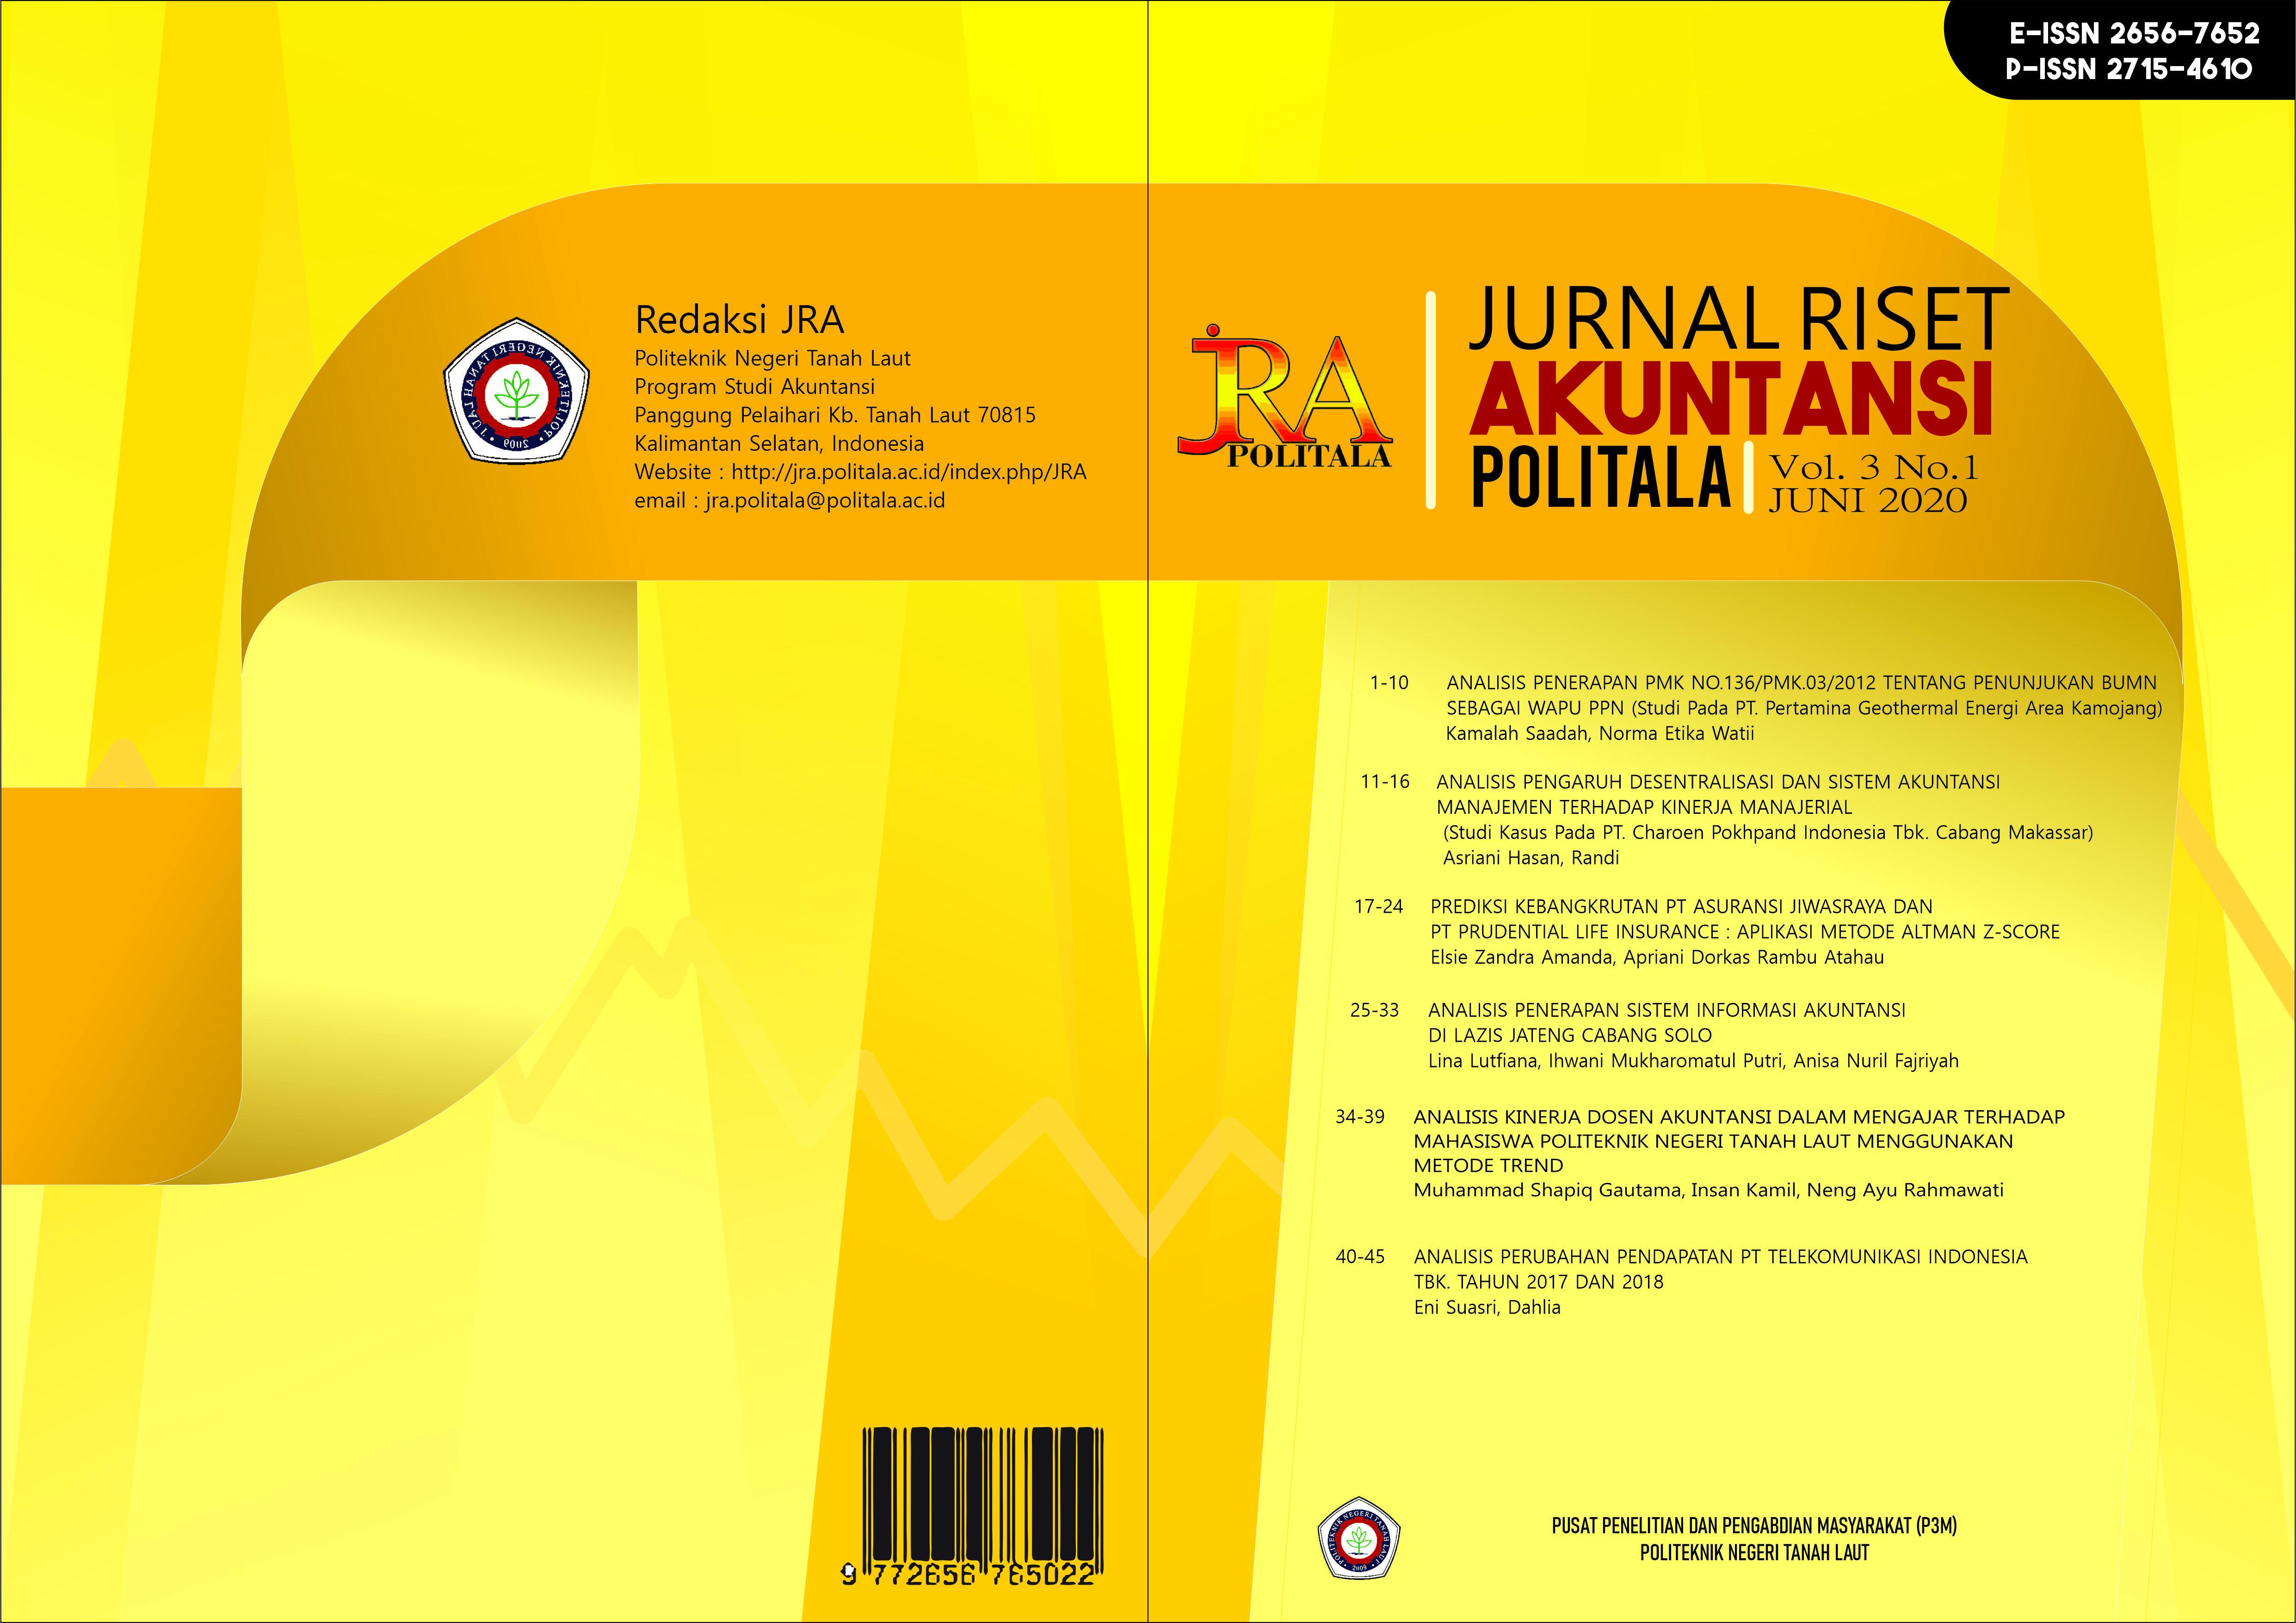 View Vol. 3 No. 1 (2020): Jurnal Riset Akuntansi Politala